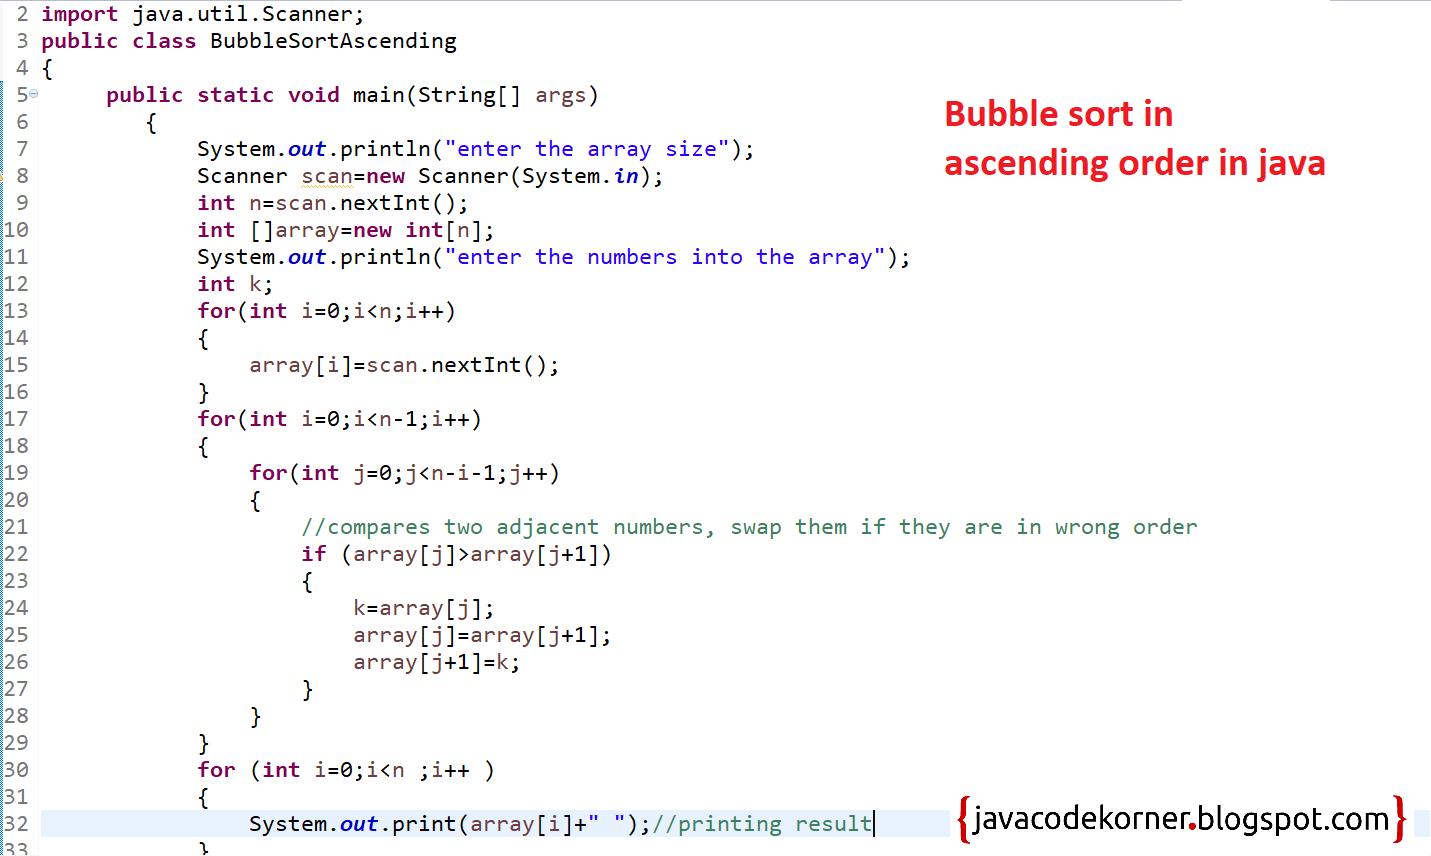 Java Program For Bubble Sort In Ascending Order